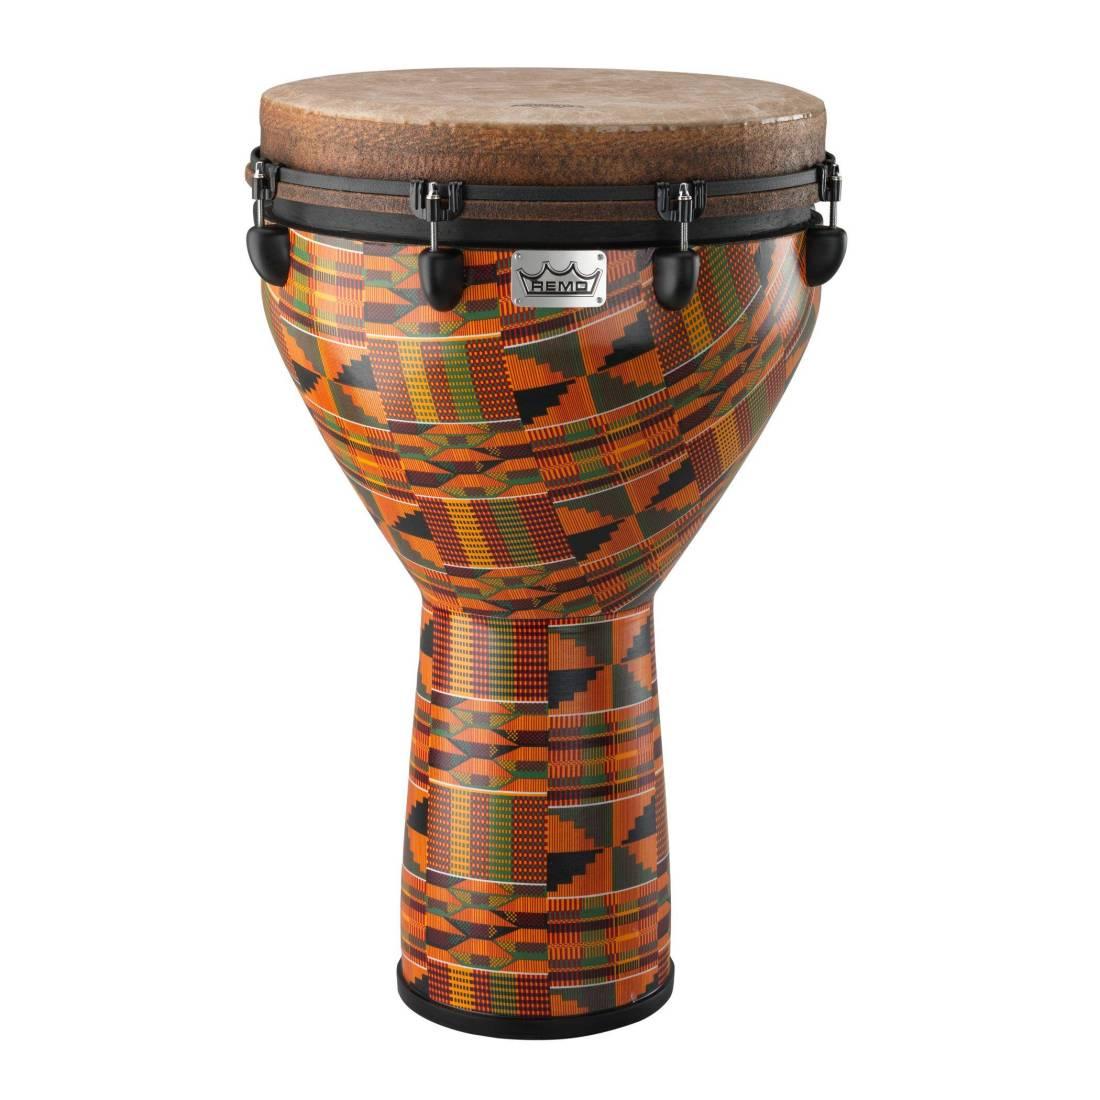 remo festival djembe drum island 12 39 39 long mcquade musical instruments. Black Bedroom Furniture Sets. Home Design Ideas